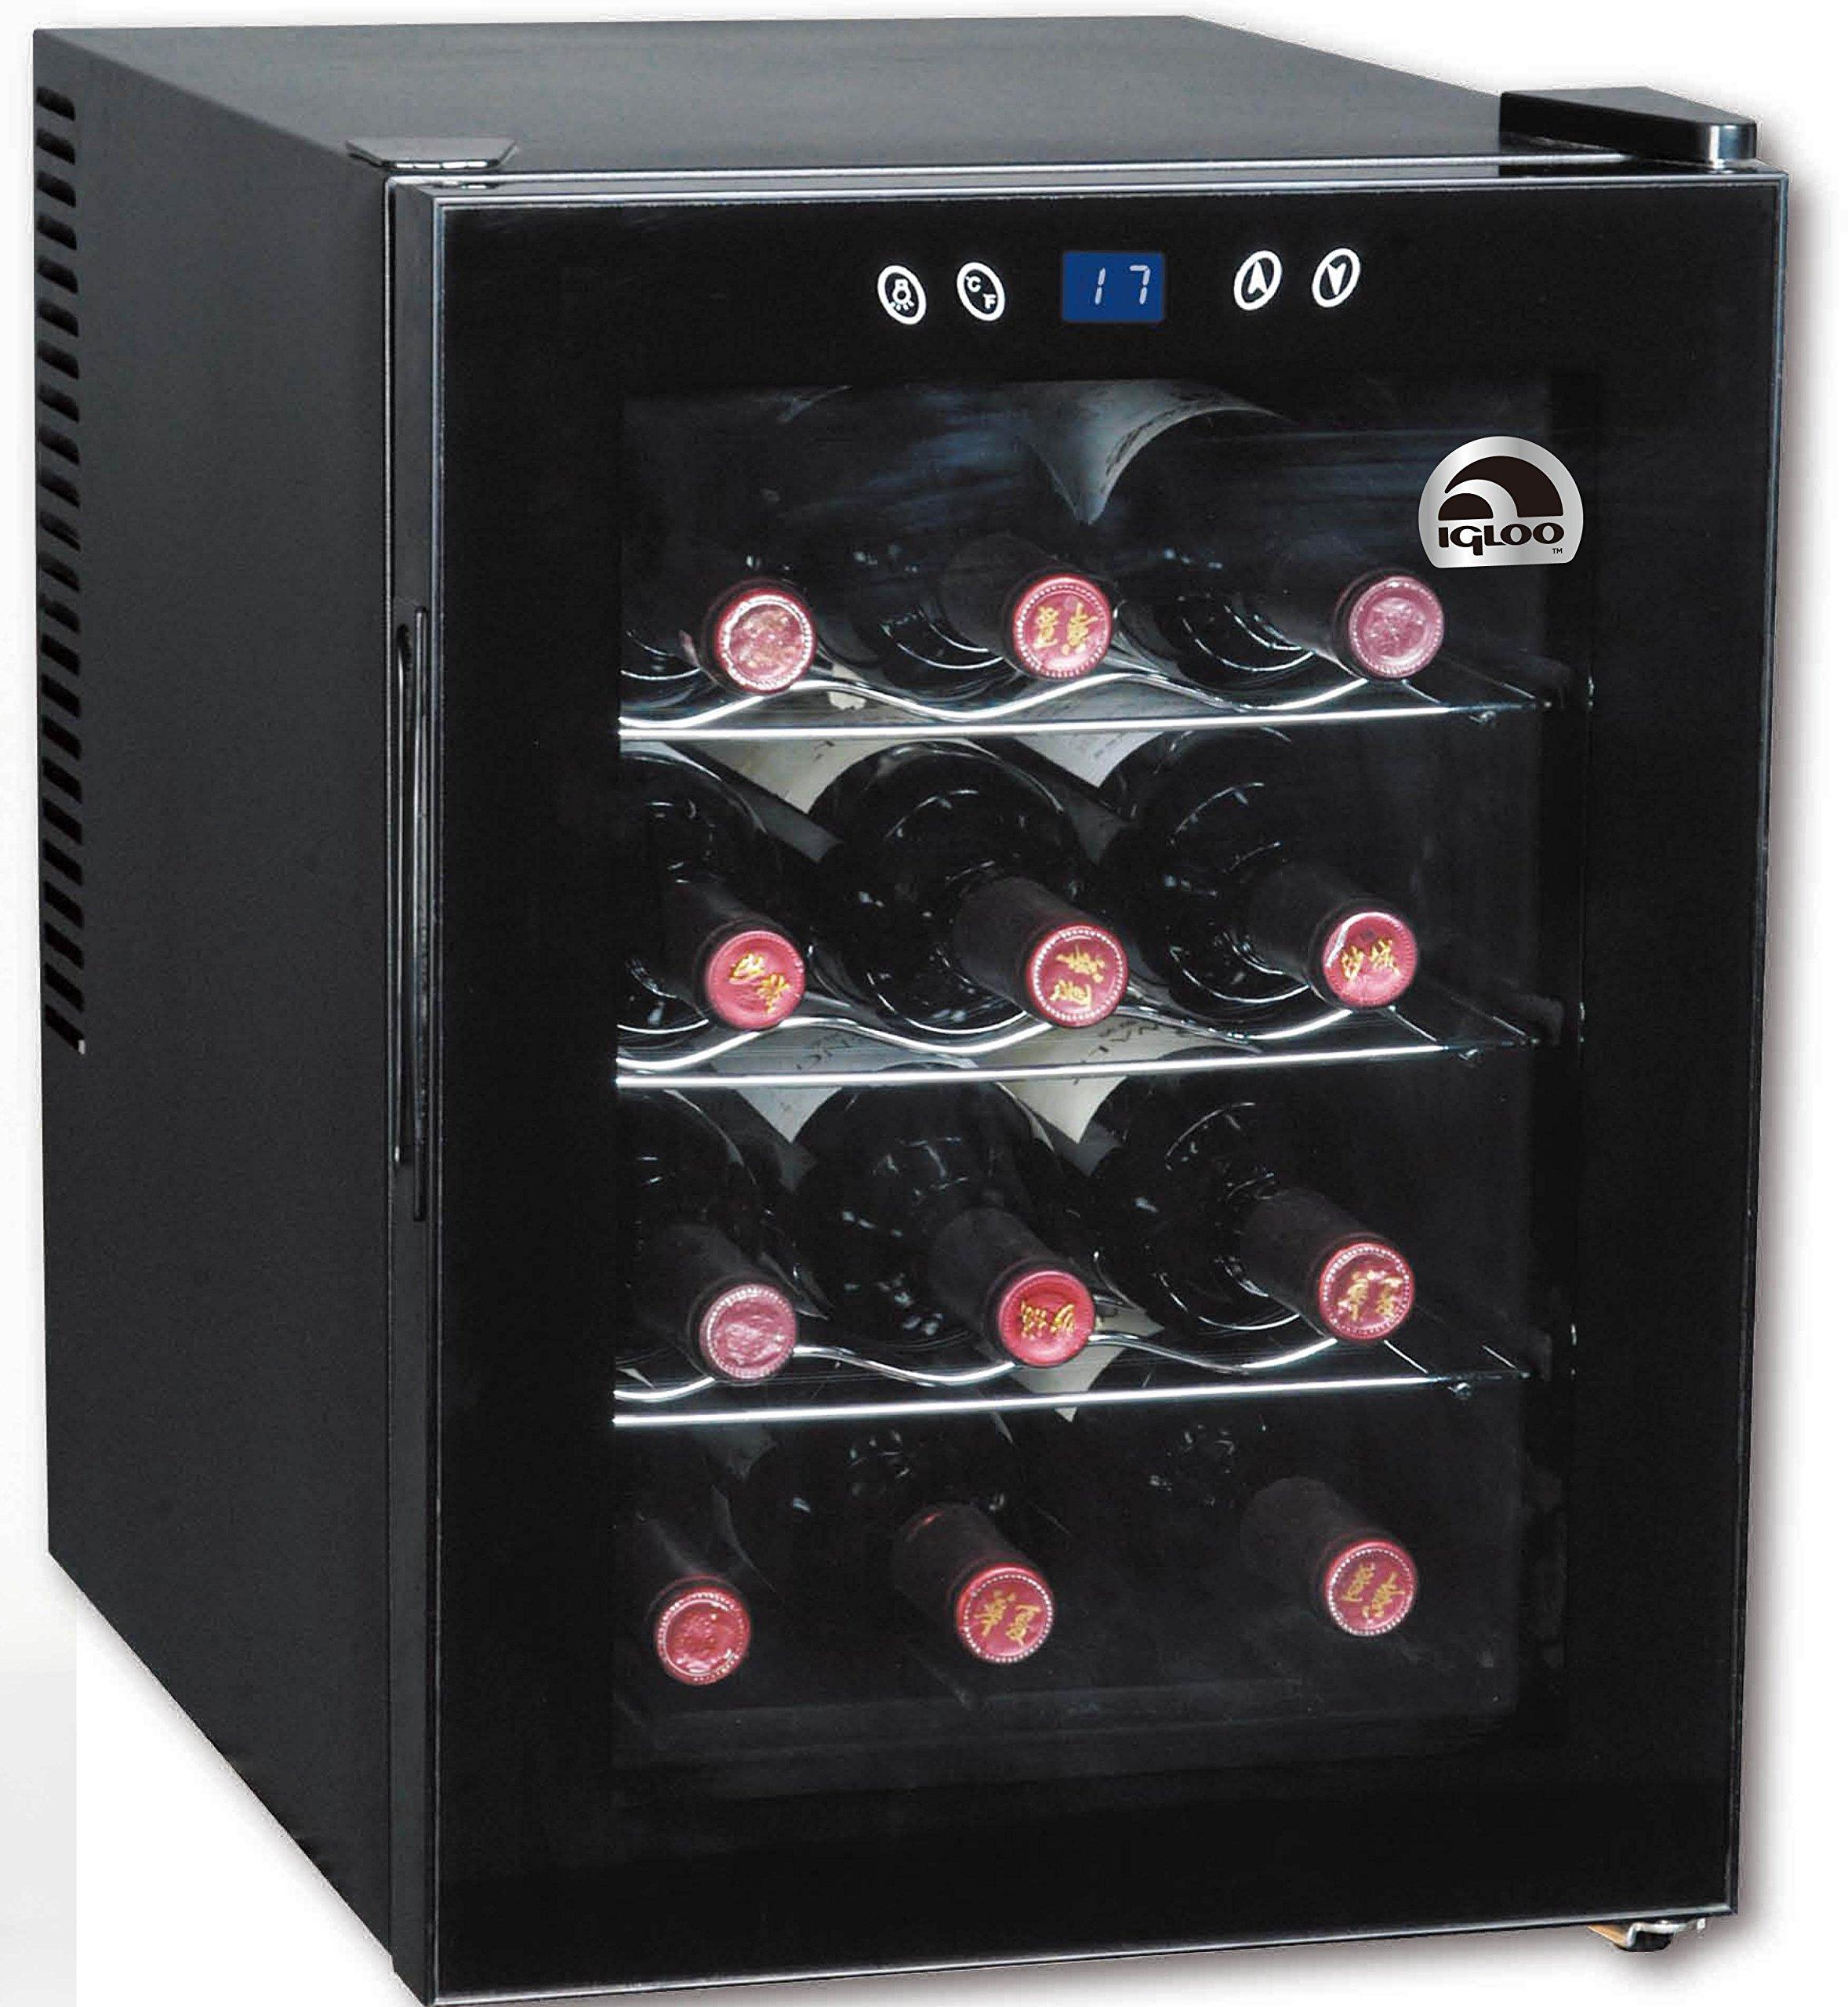 Igloo FRW133 RFRW133 Wine Cooler, Black